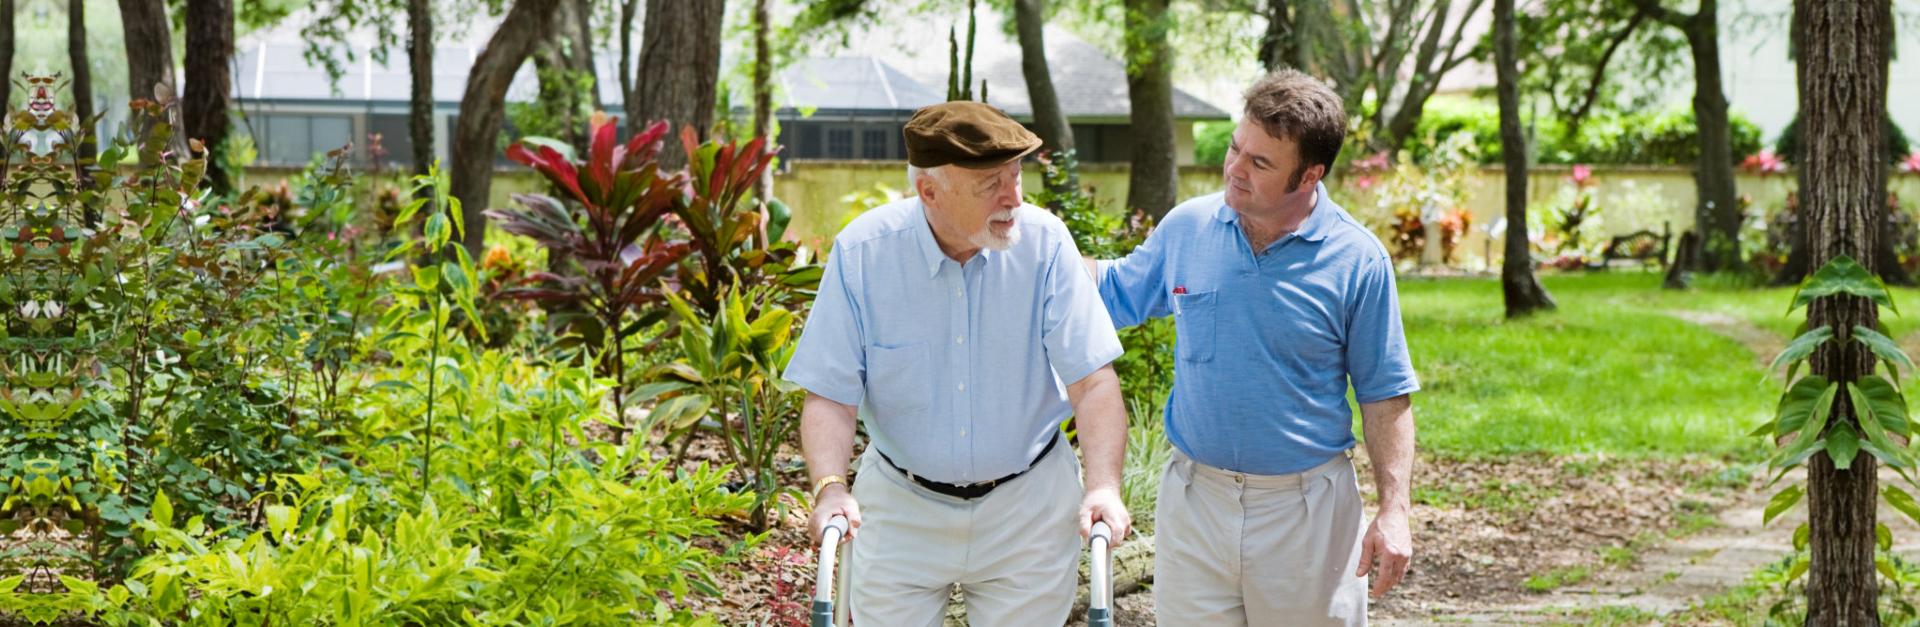 Caregiver and elder walking in the garden